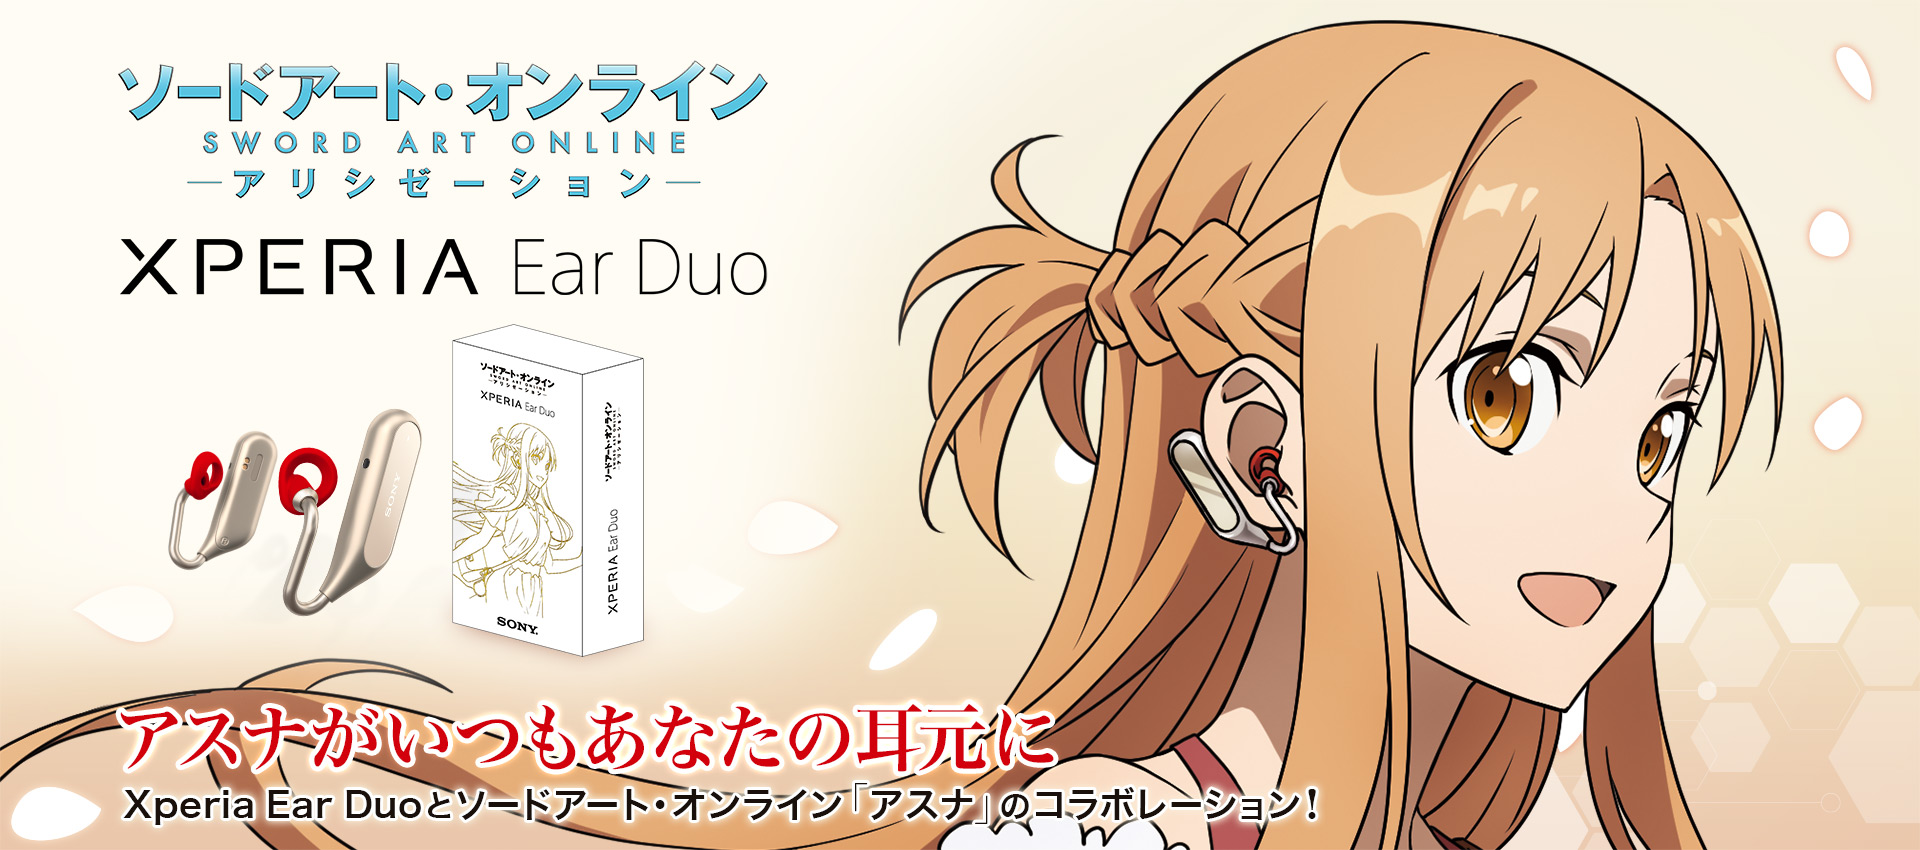 Xperia Ear Duoとソードアート オンライン アスナ の